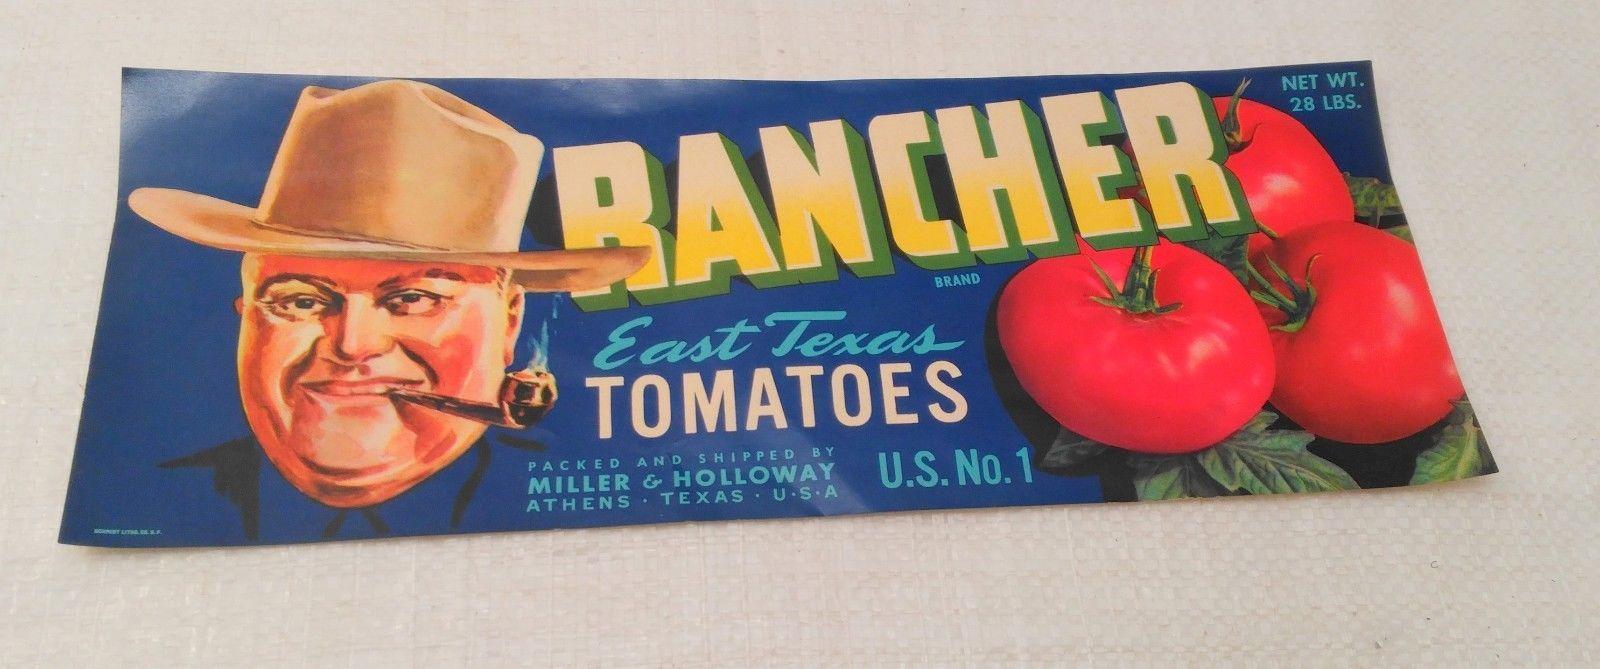 RANCHER Brand, Athens Texas *AN ORIGINAL TOMATO CRATE LABEL* 252